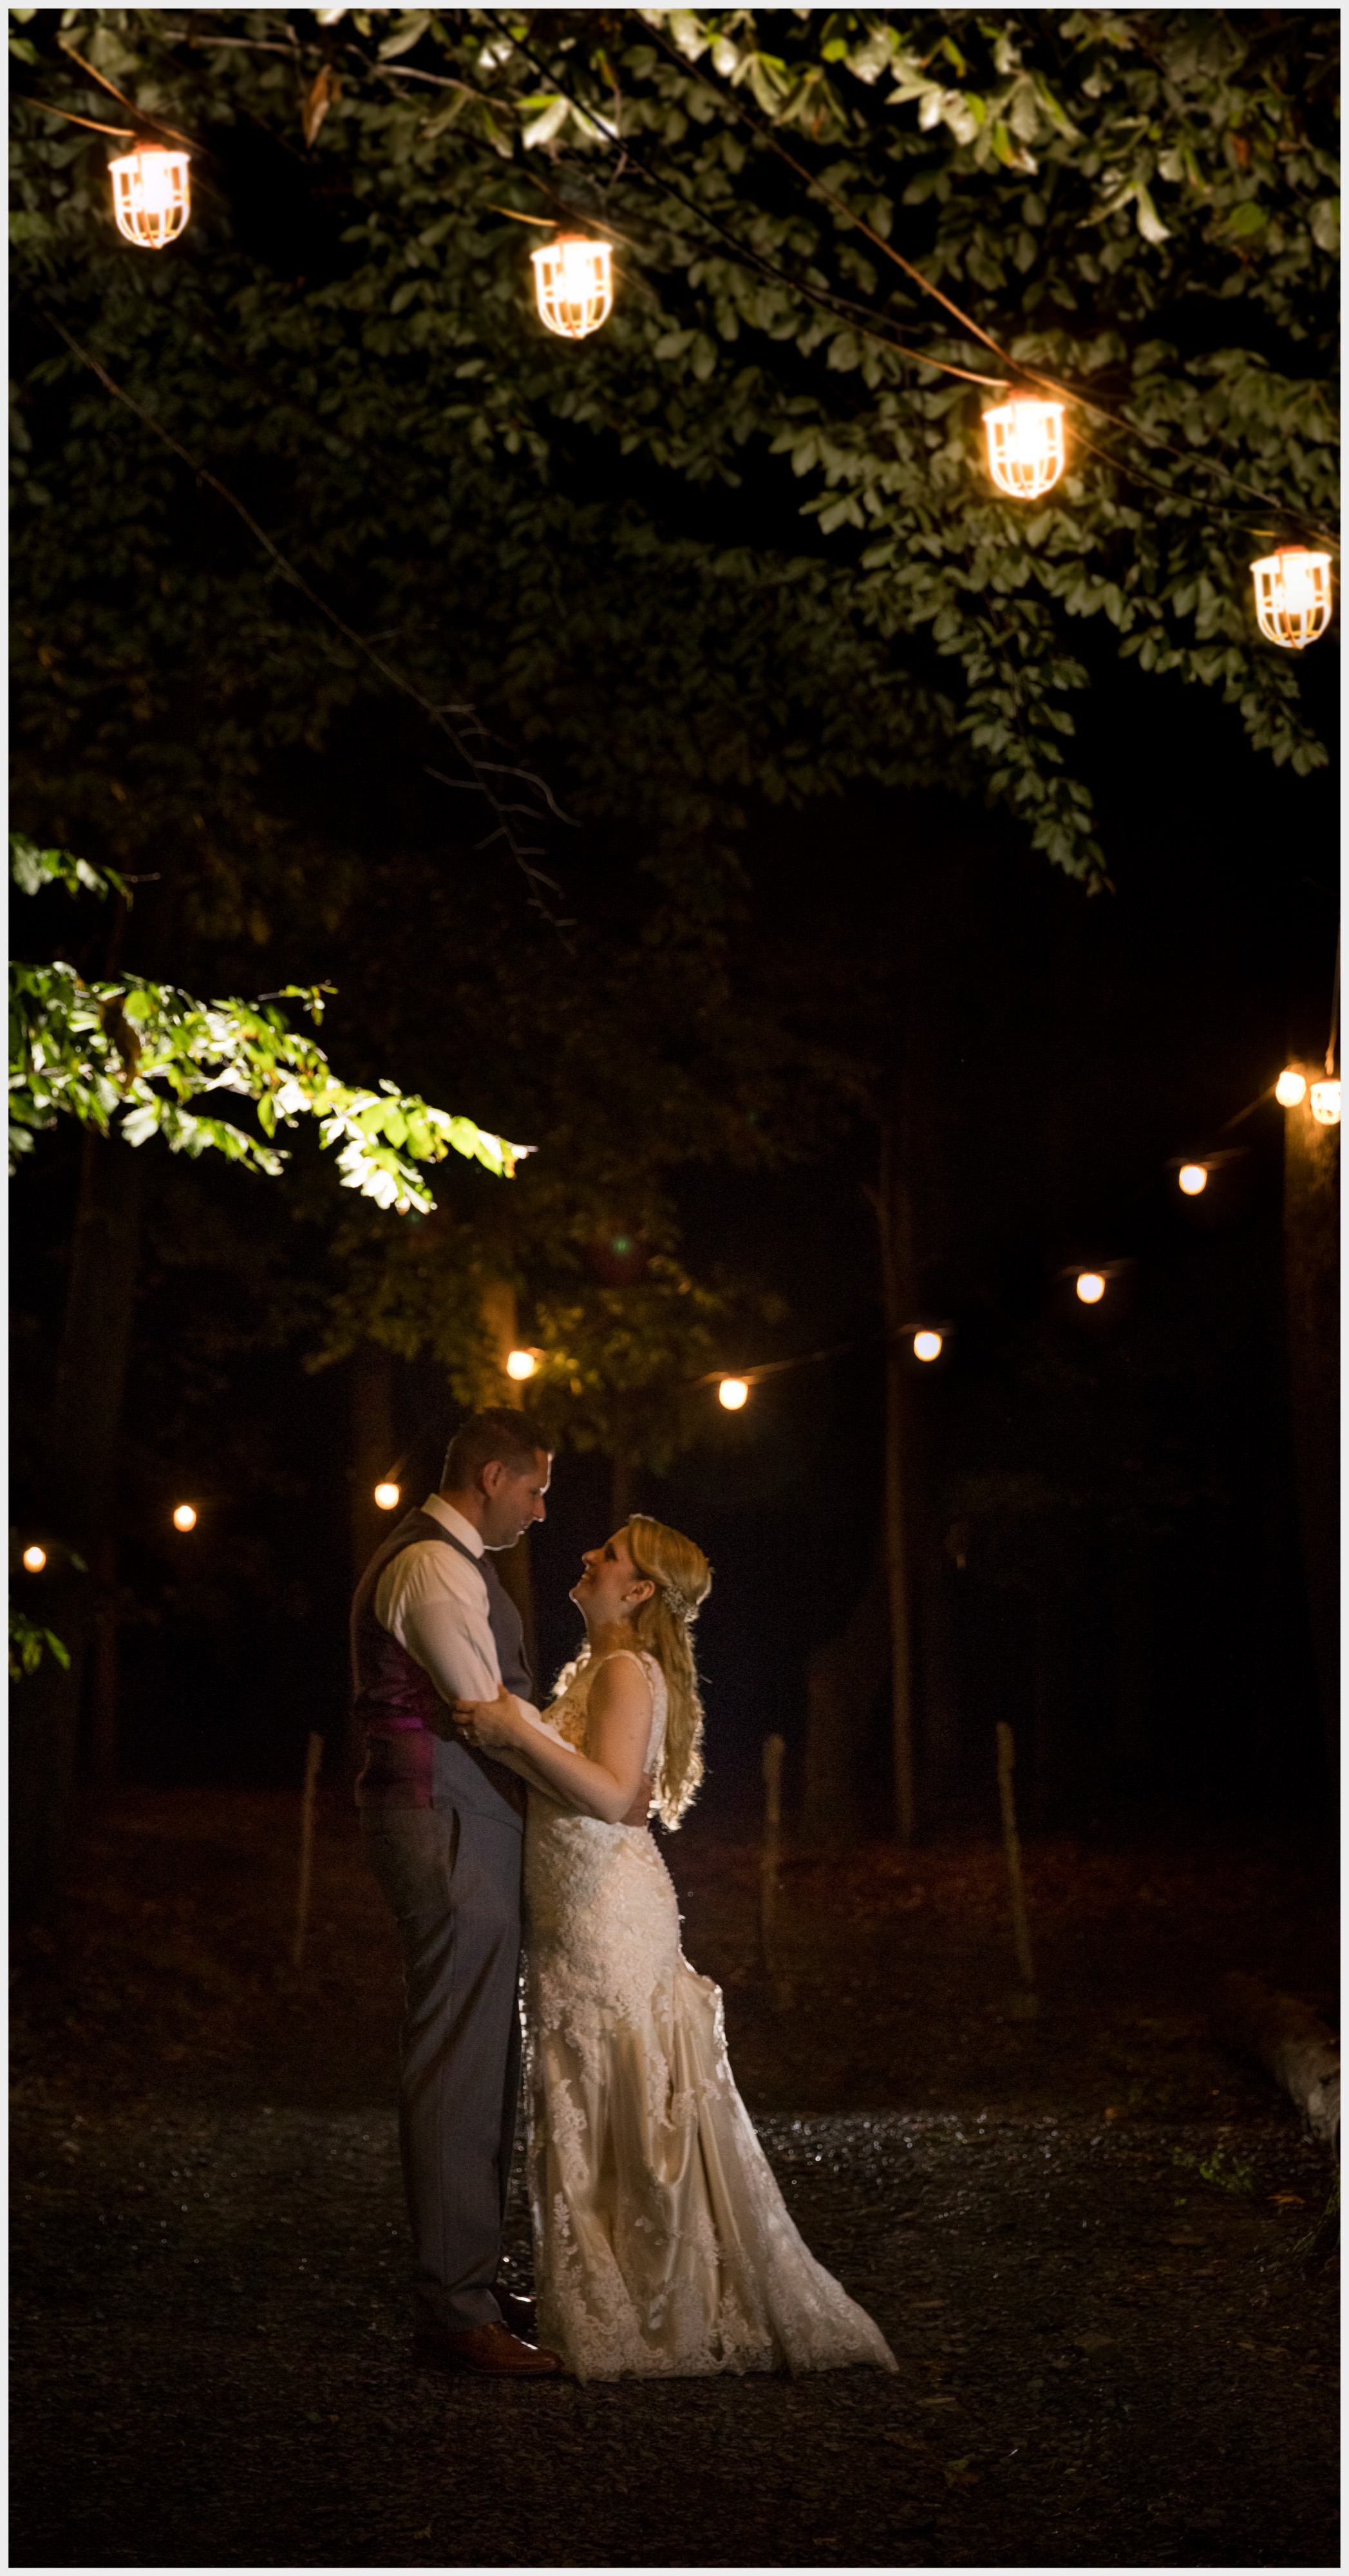 Cassondre Mae Photography Emmerich Tree Farm Wedding 22.jpg